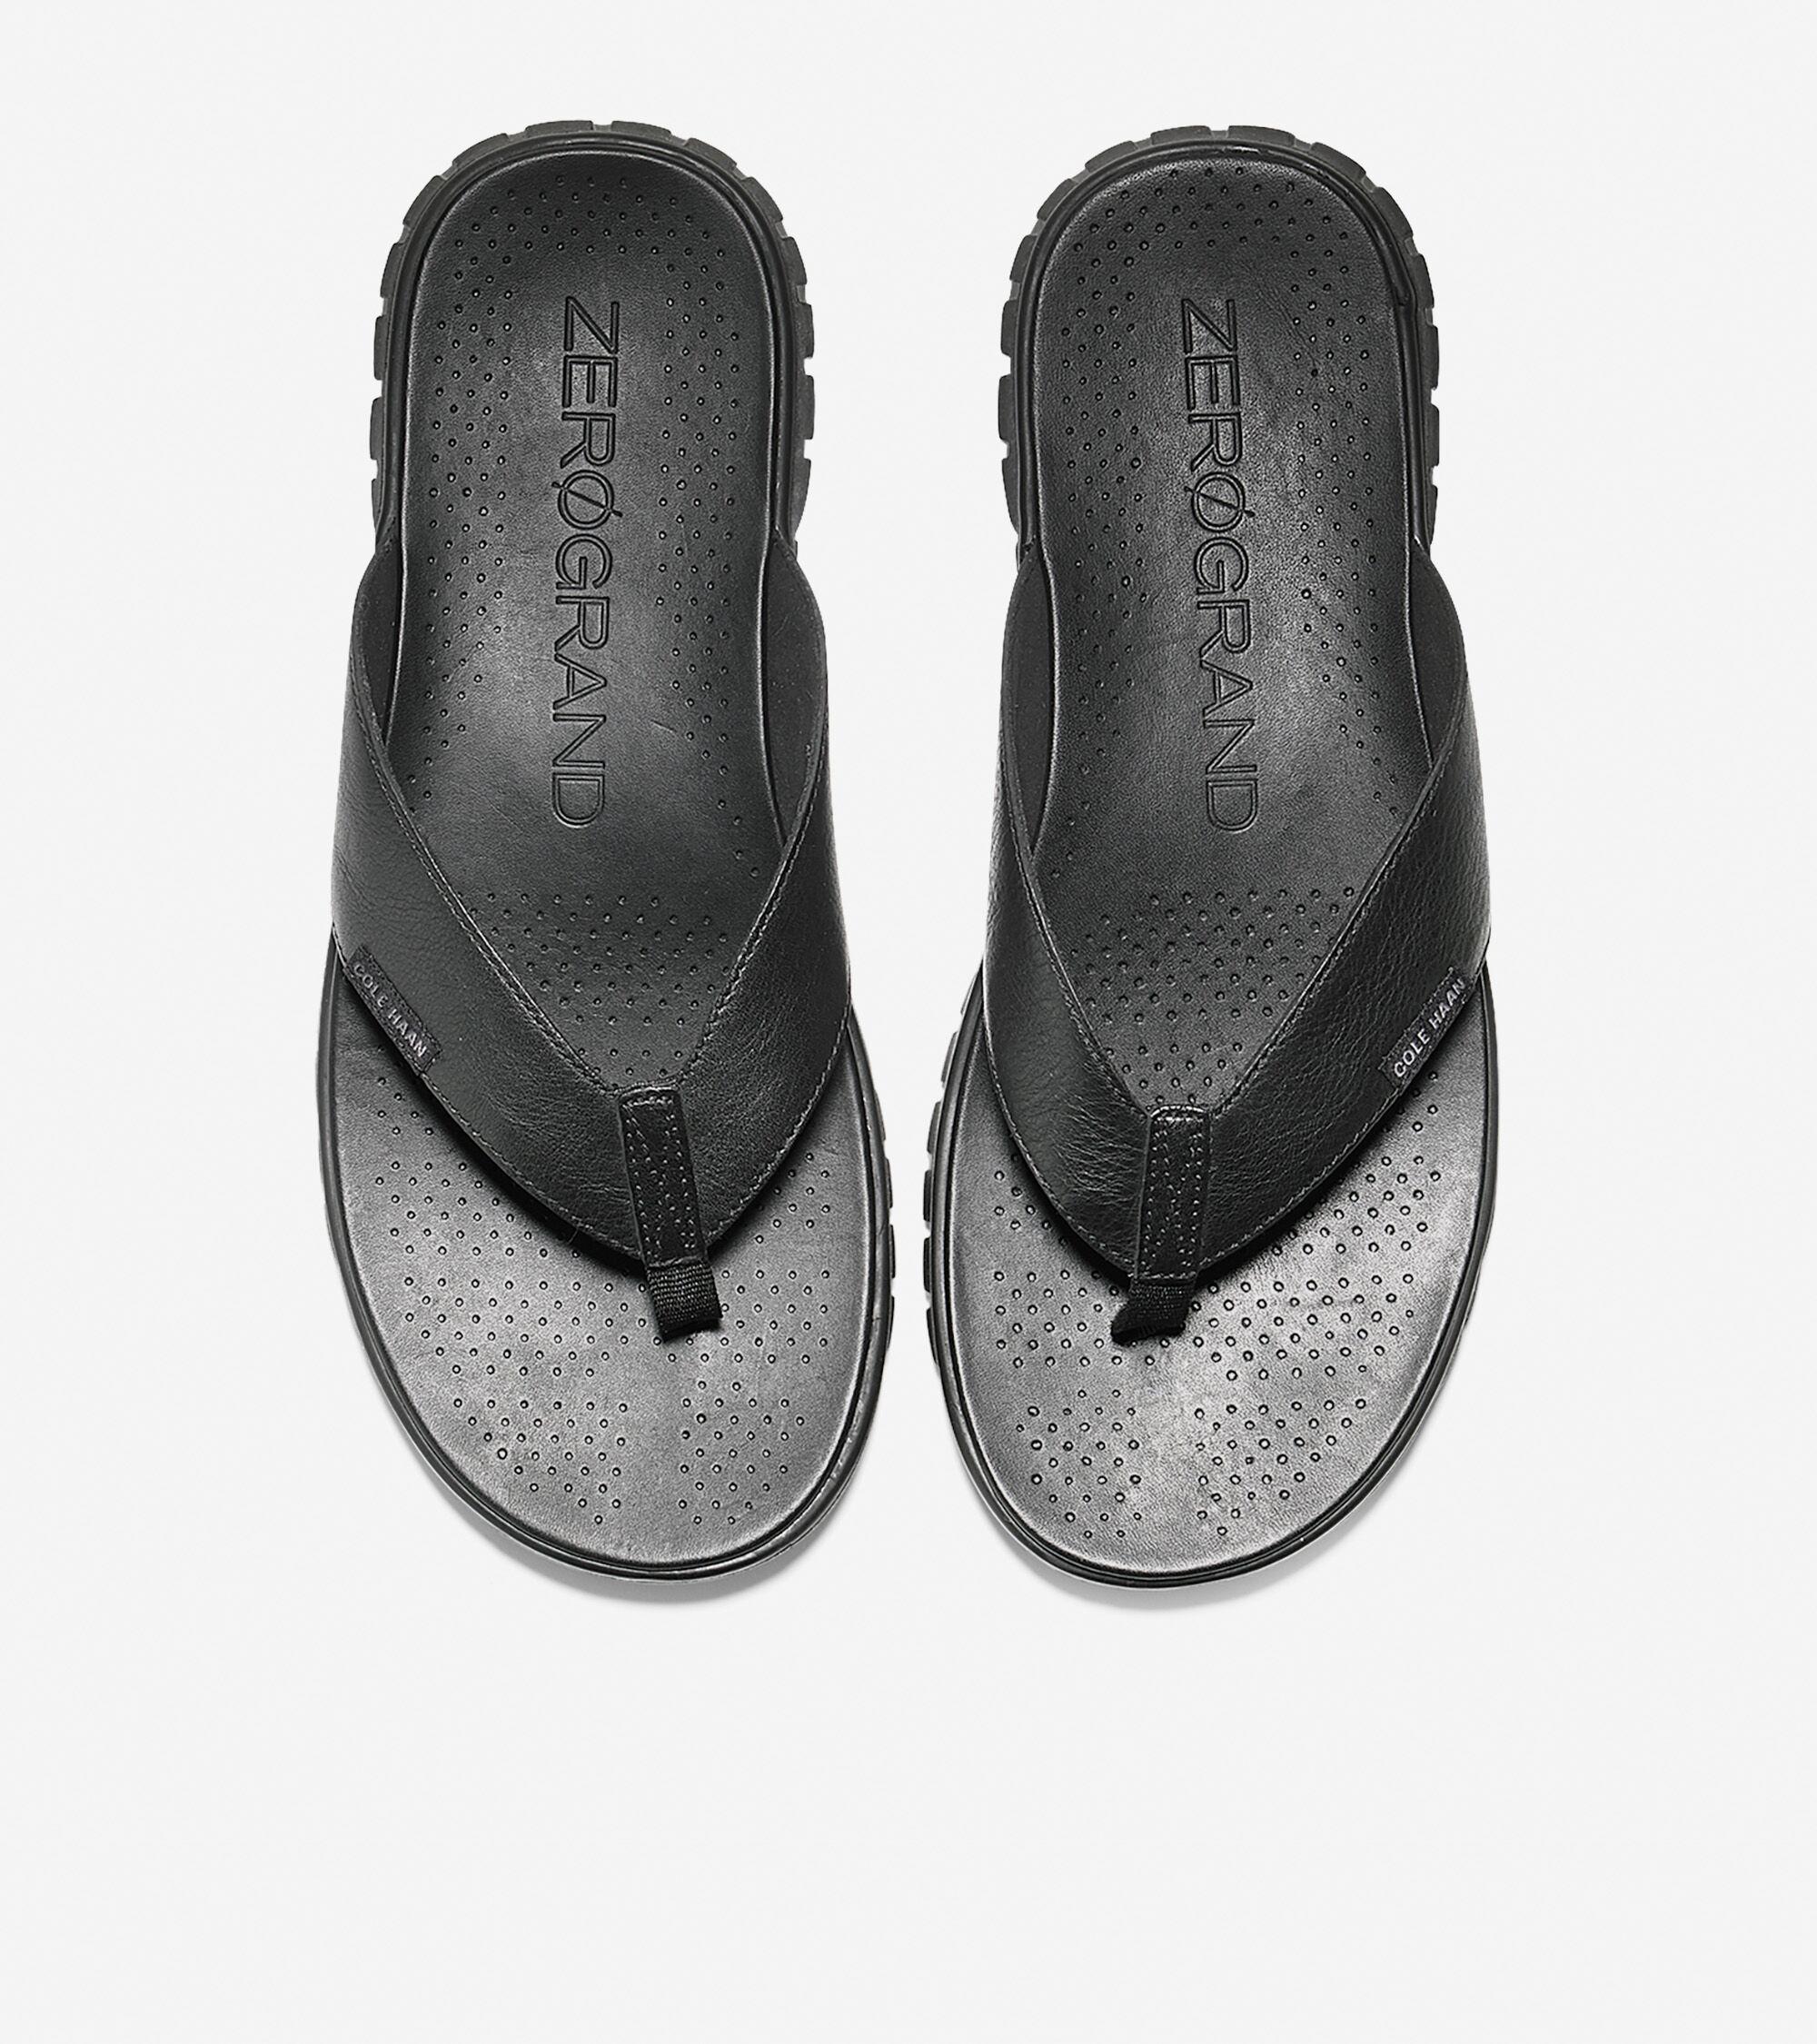 Black jesus sandals -  Men S Zer Grand Sandal